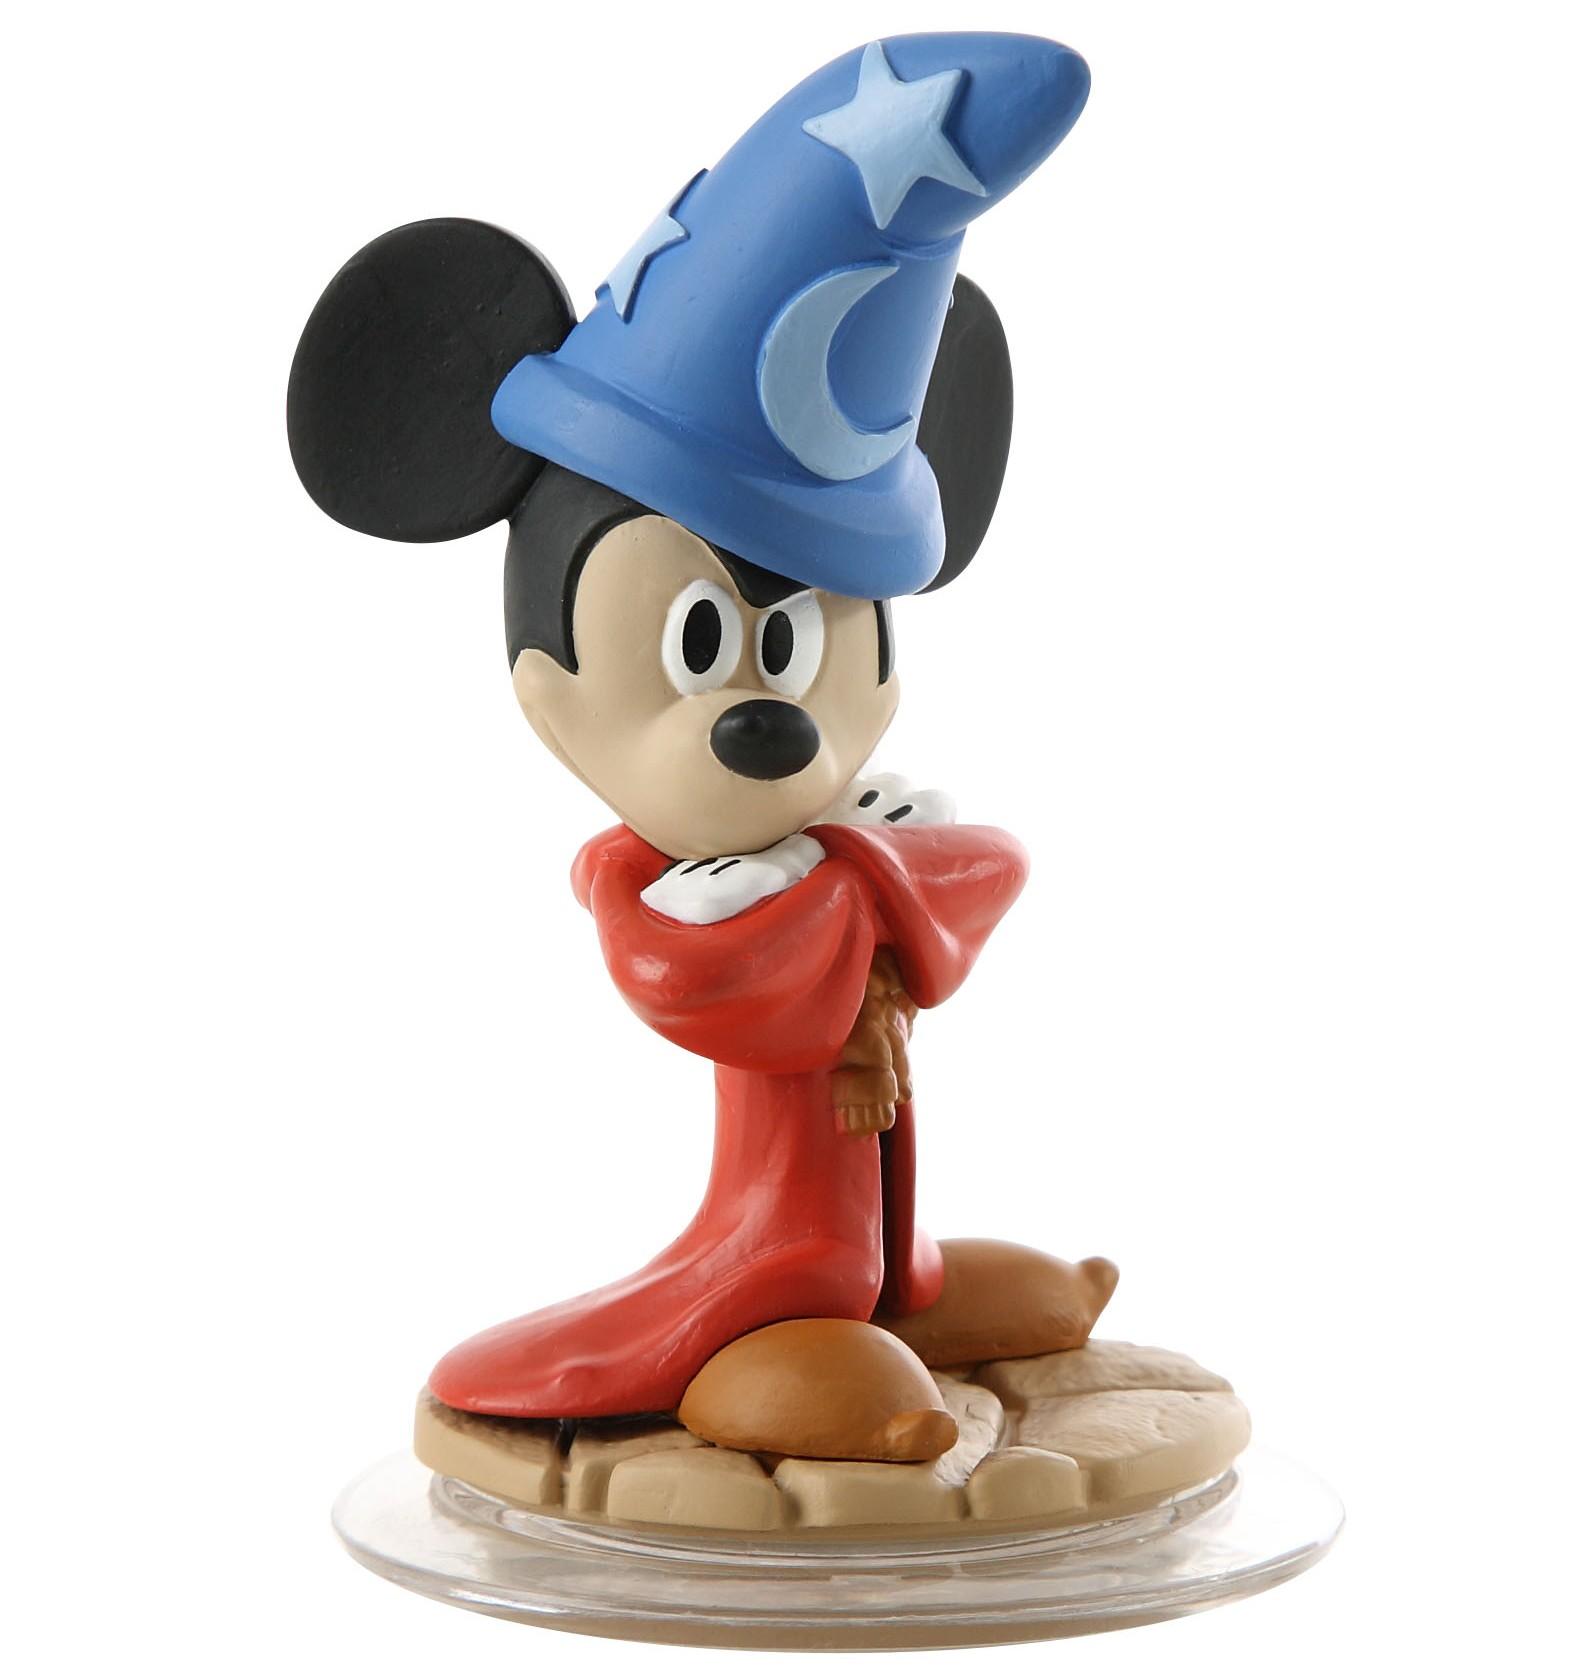 Disney Infinity Sorcerer Mickey Figure